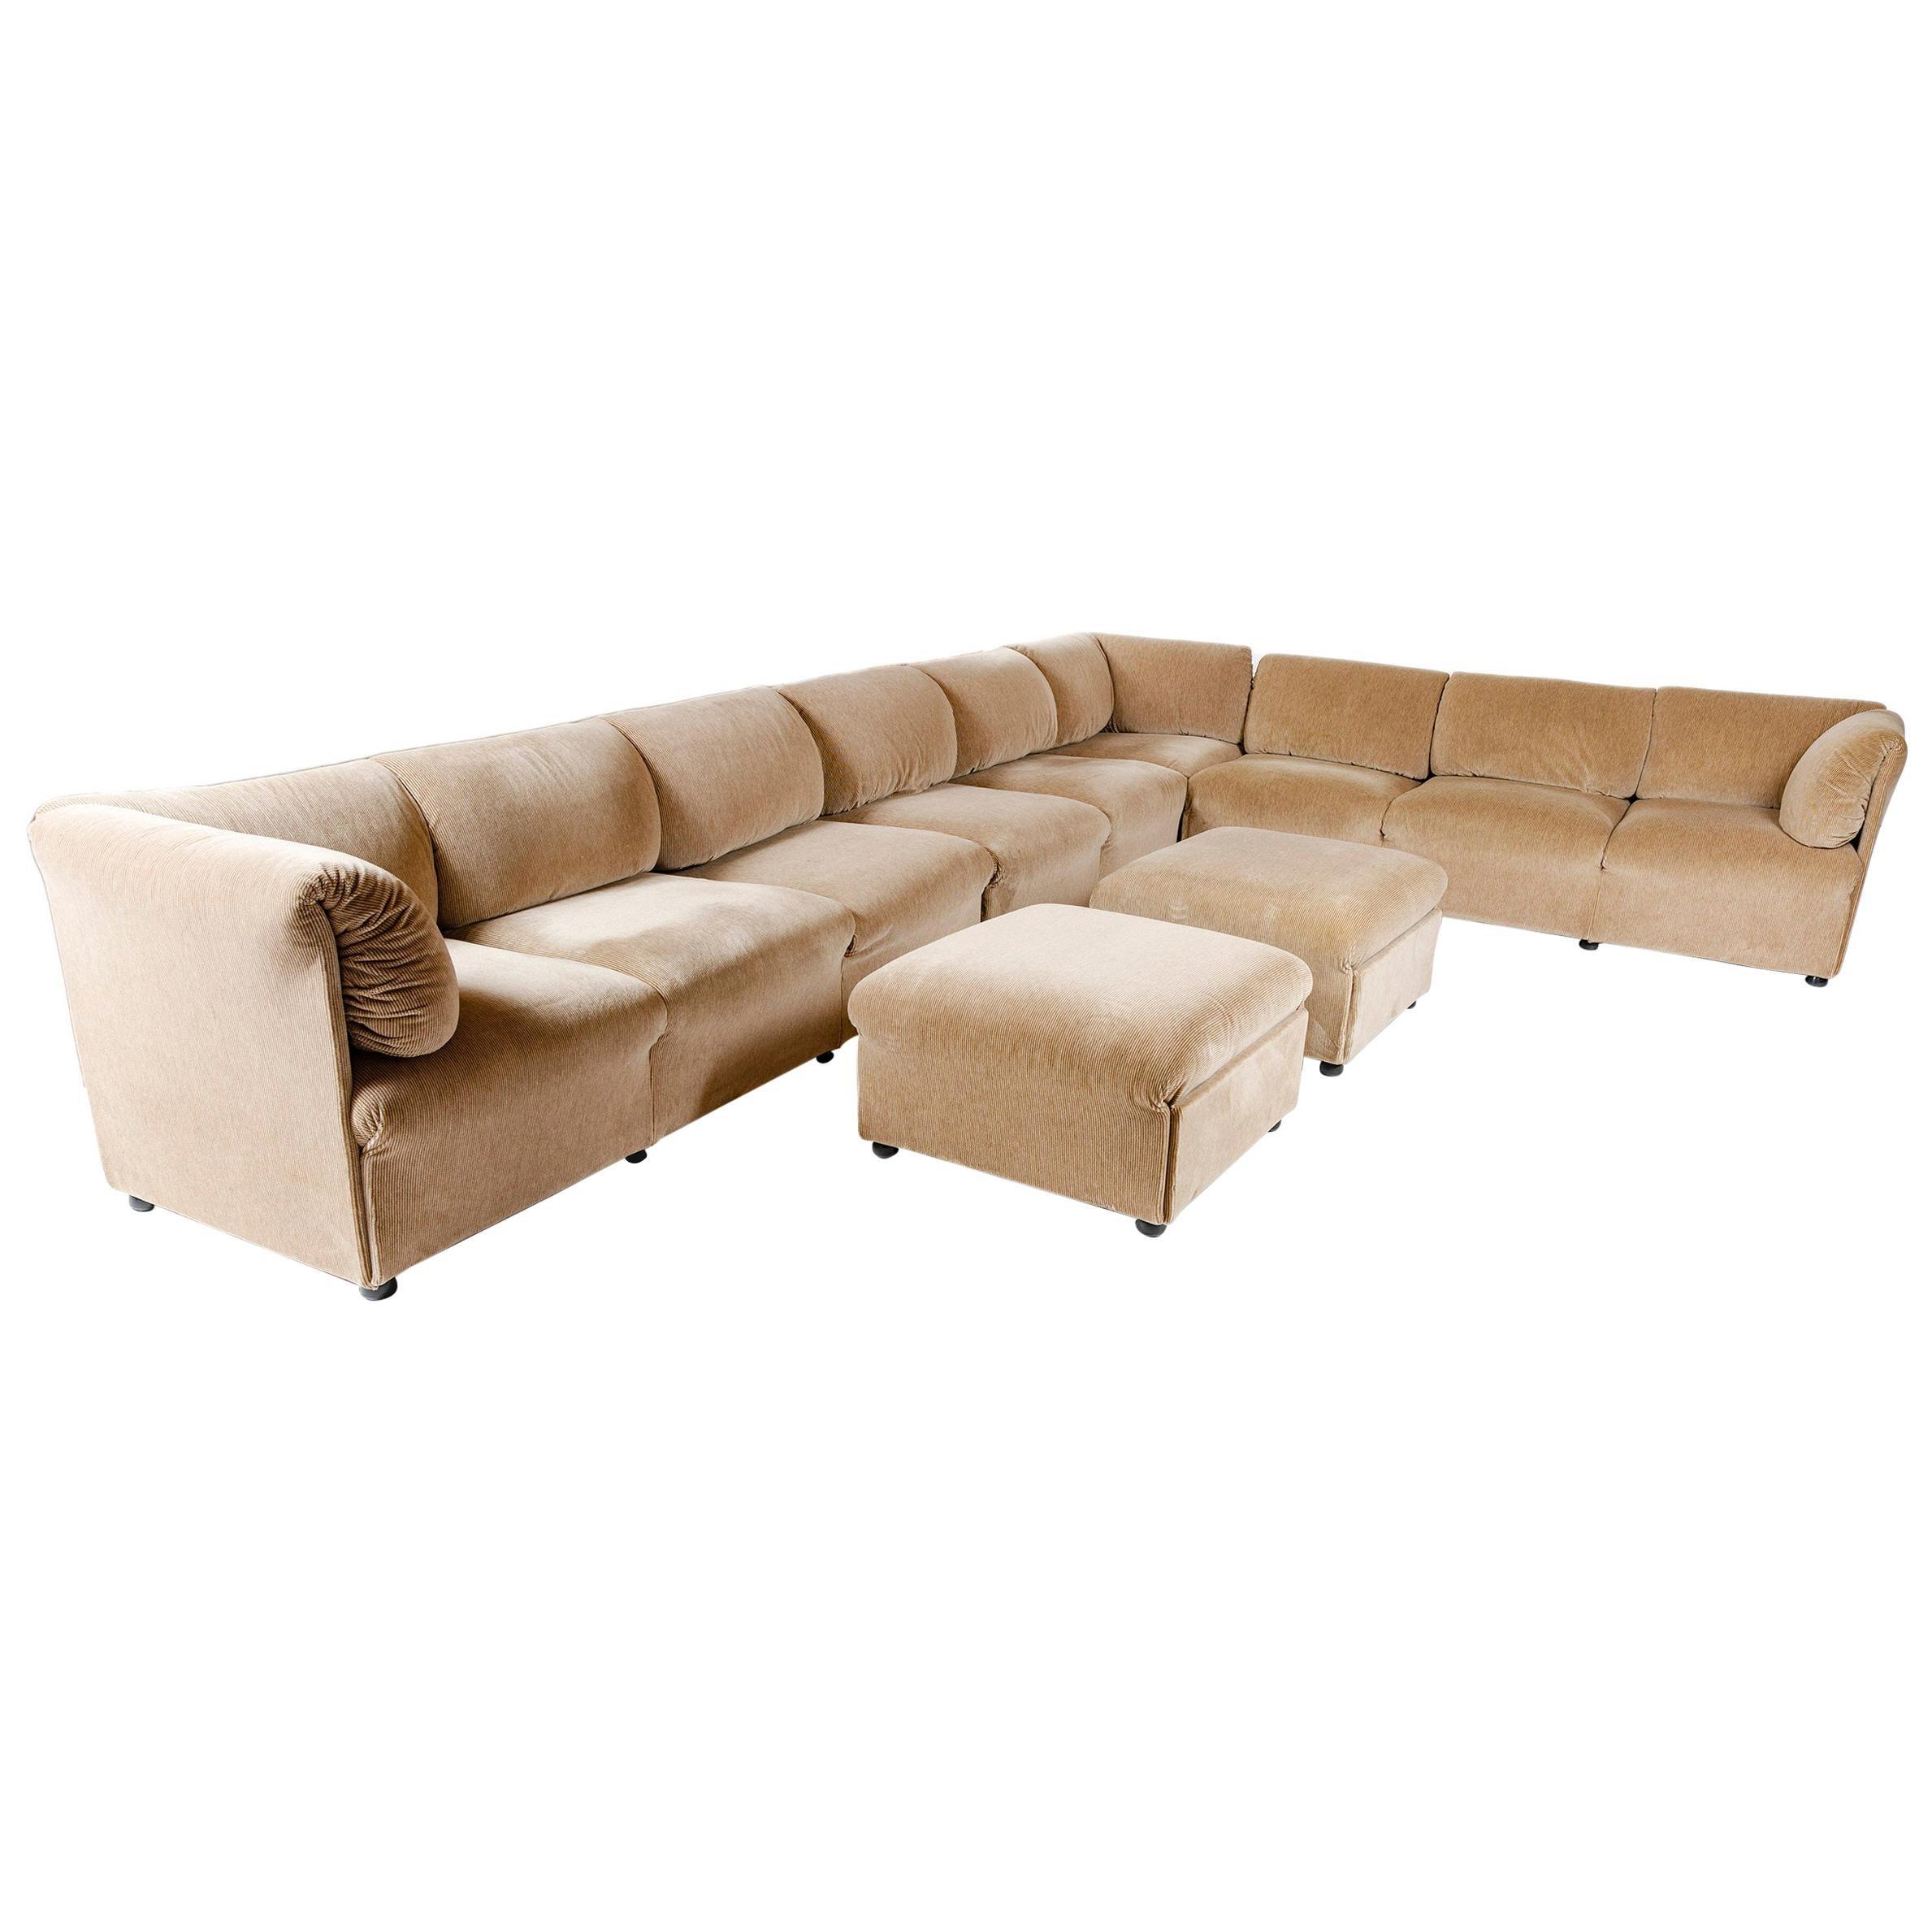 1980s Italian Modular Sofa by Cassina